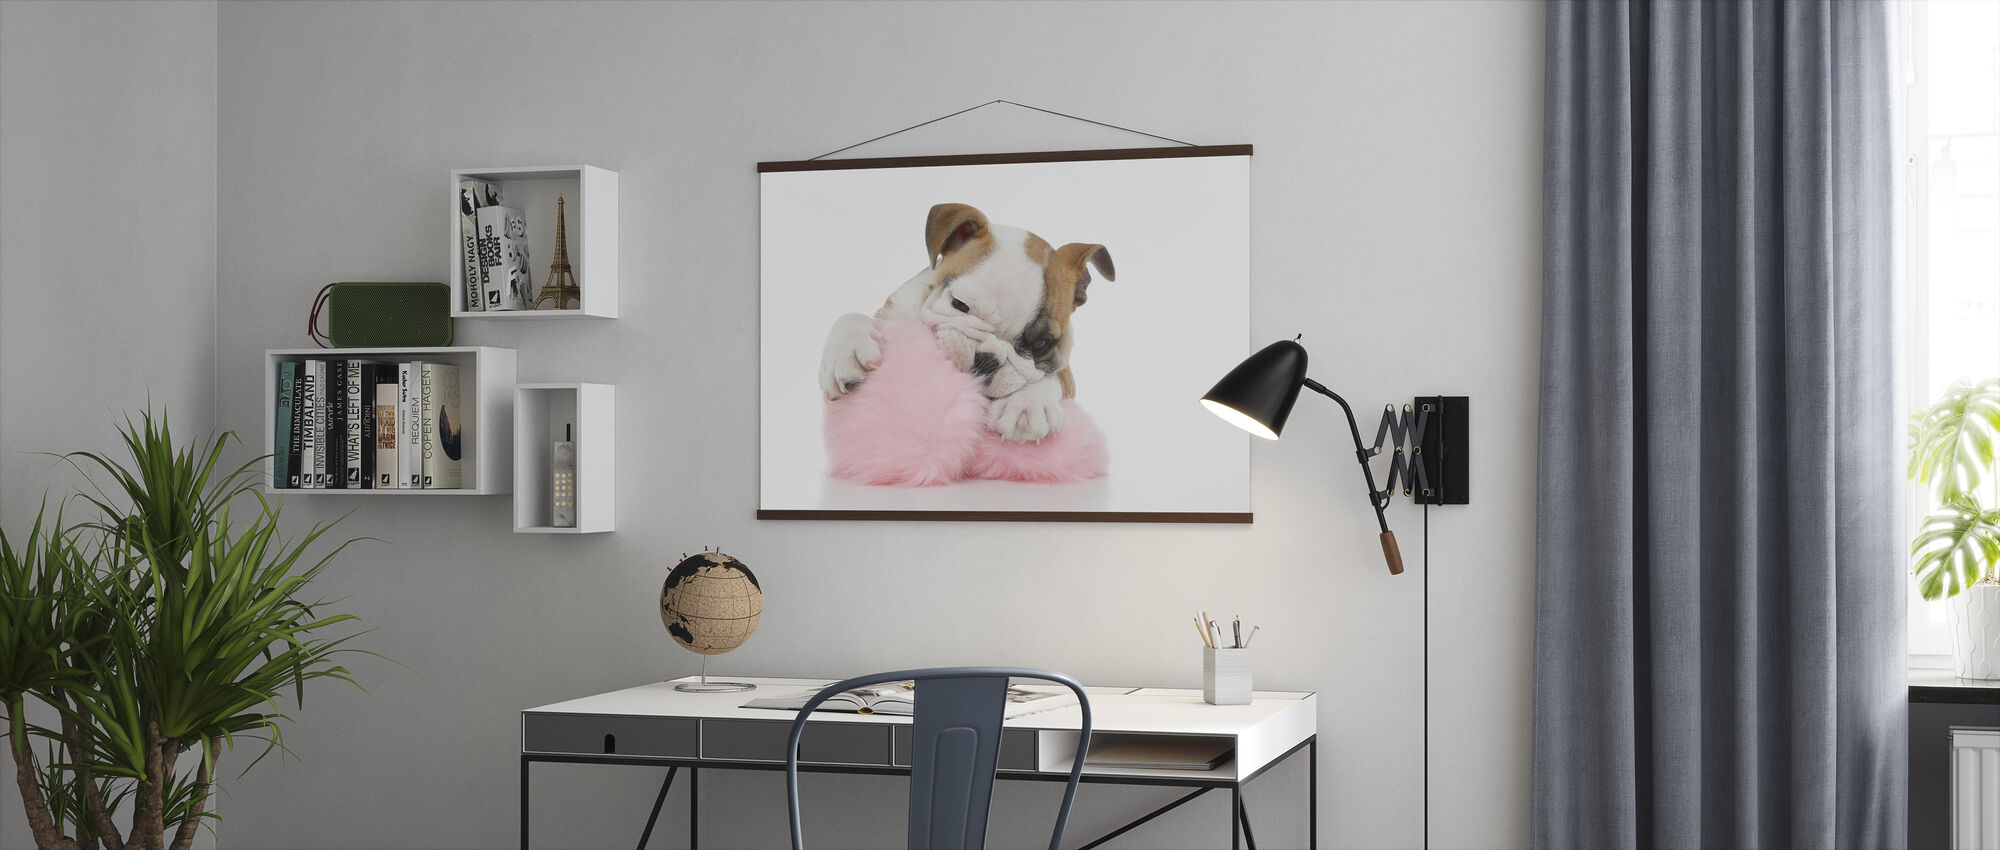 Busiga Bulldog valp - Poster - Kontor